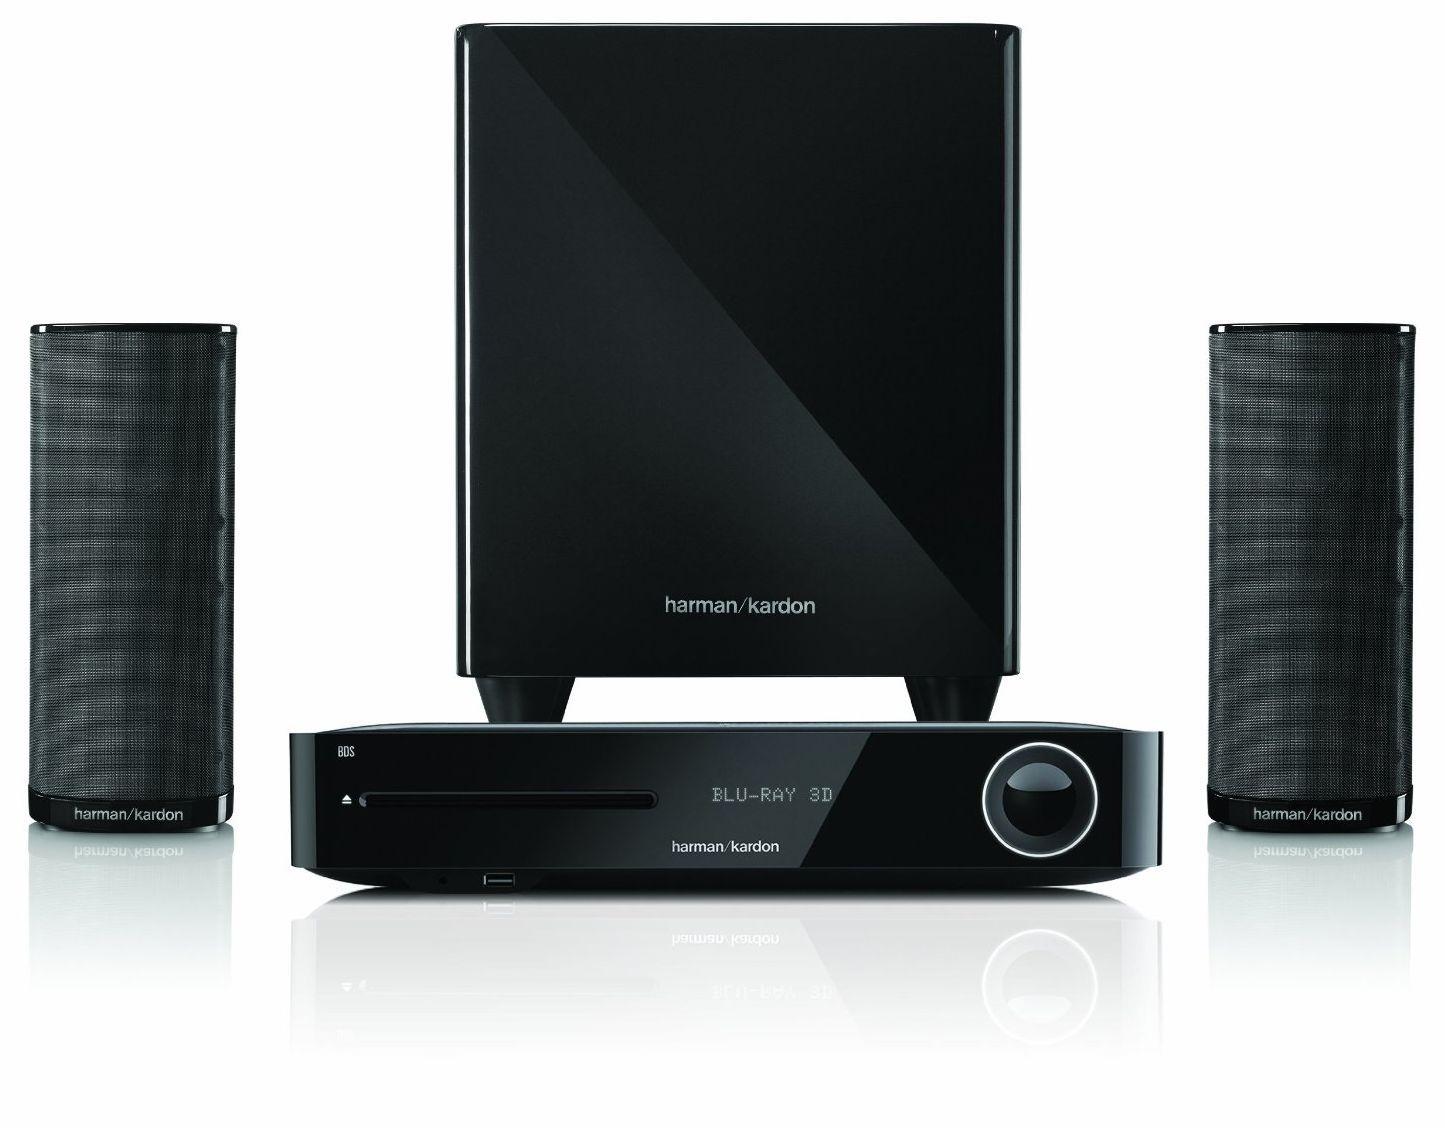 Система за домашно кино harman/kardon BDS 385S - 2.1, черна и Blu-Ray система - 3